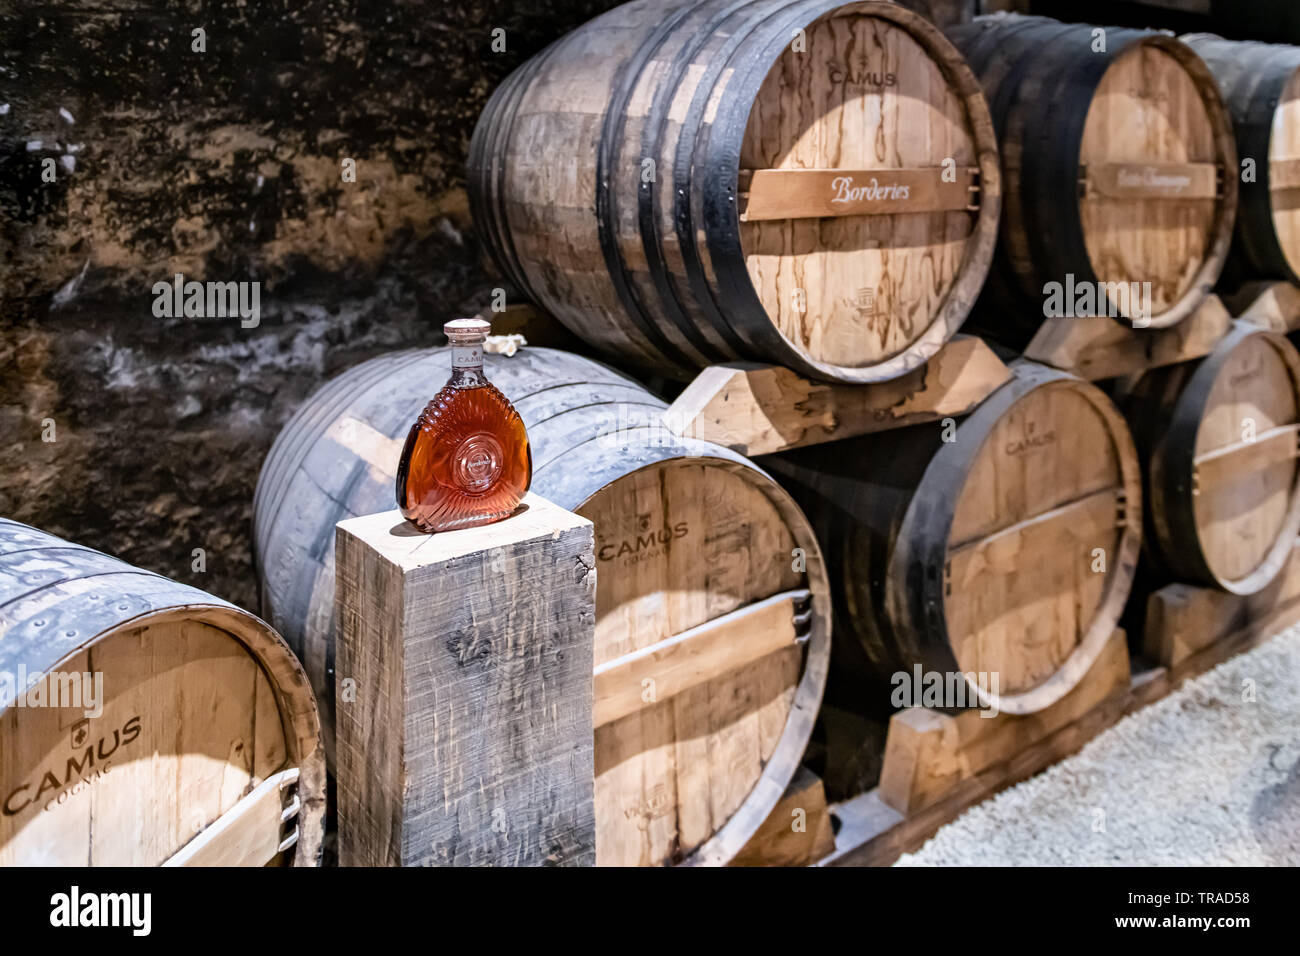 Oak Barrels of Camus Cognac in France - Stock Image